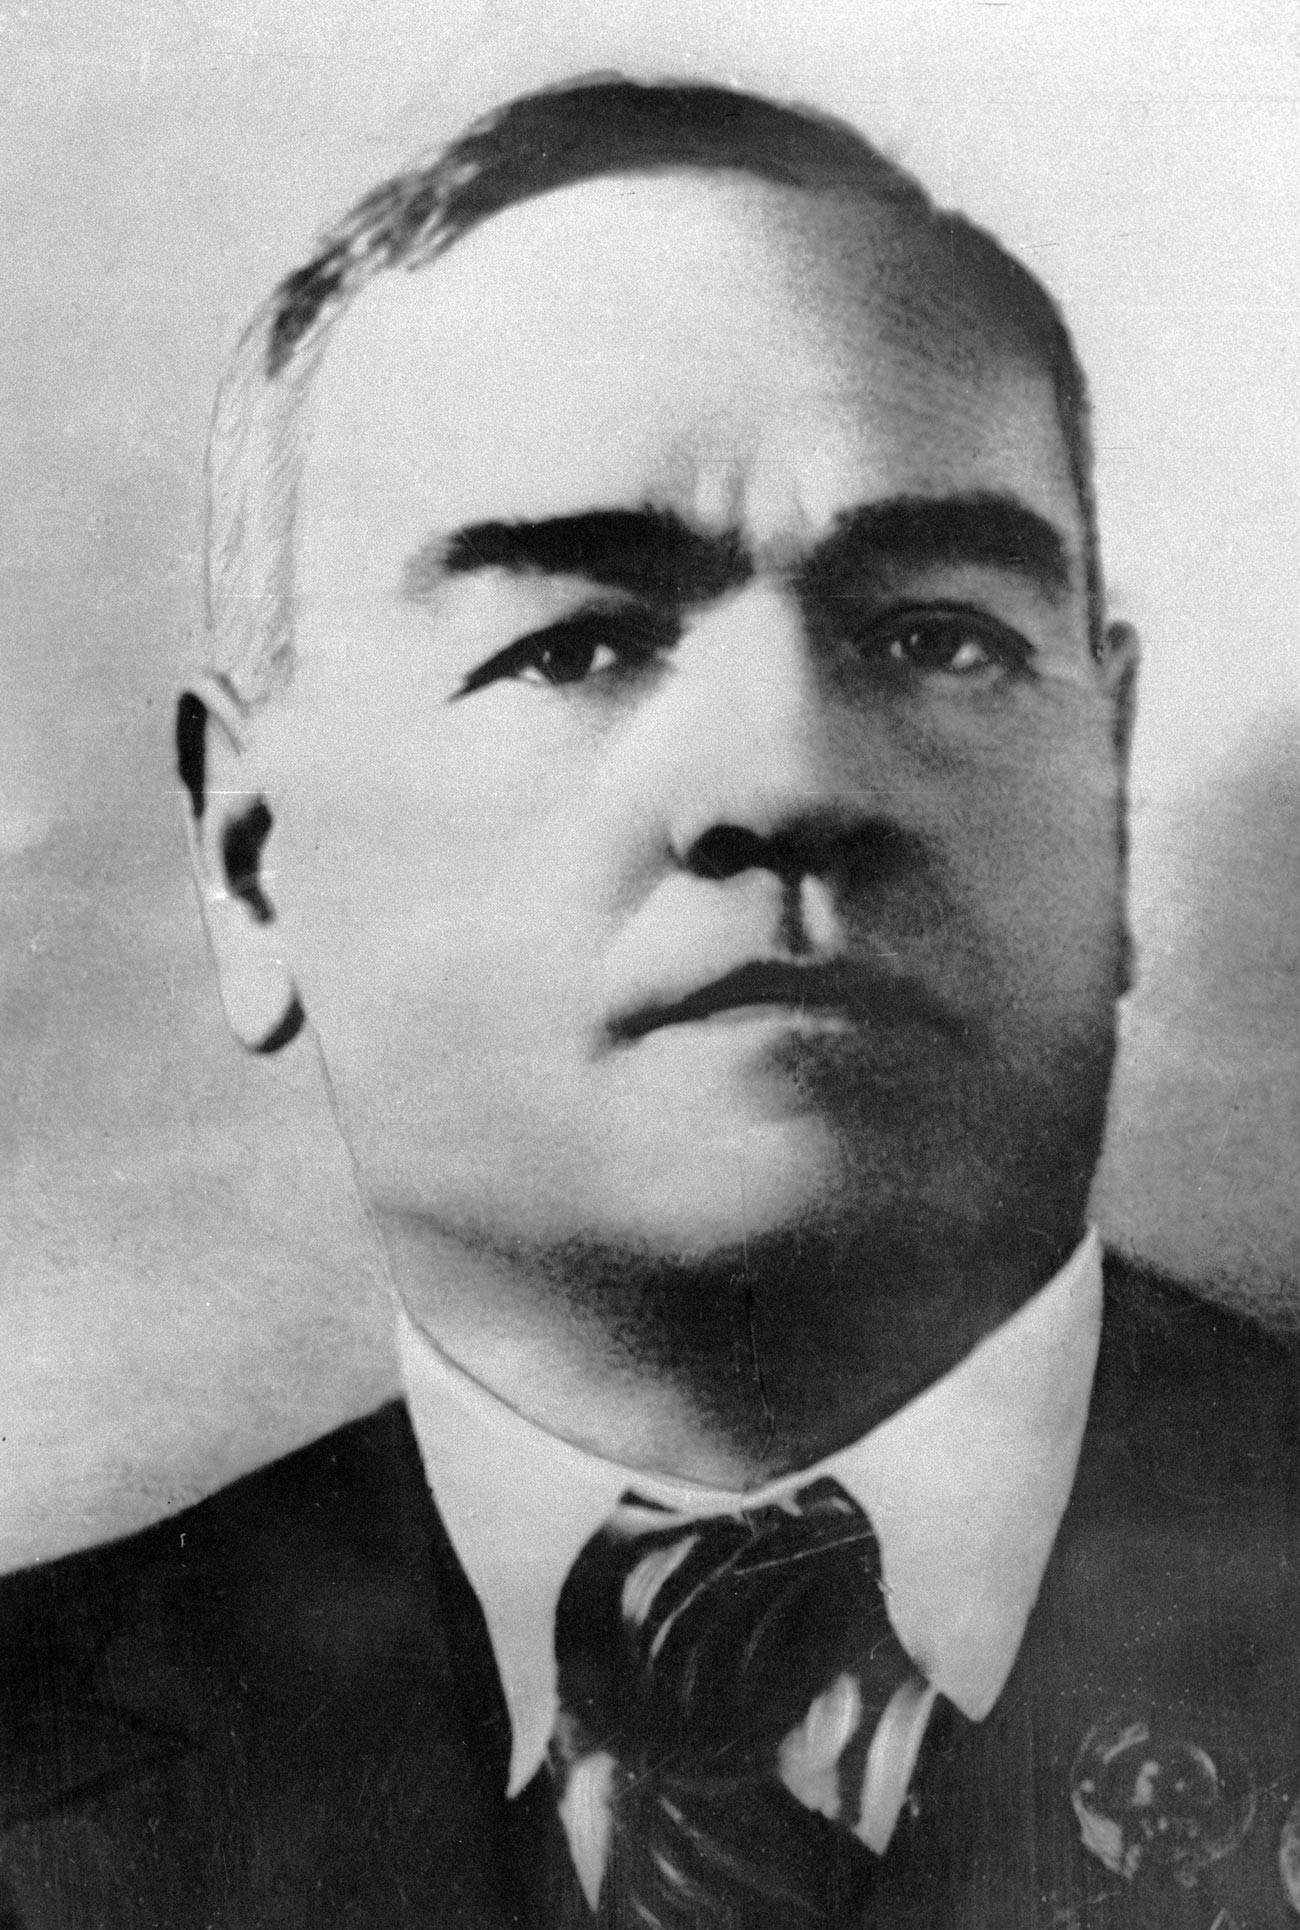 Le constructeur Vladimir Petliakov (1891-1942)